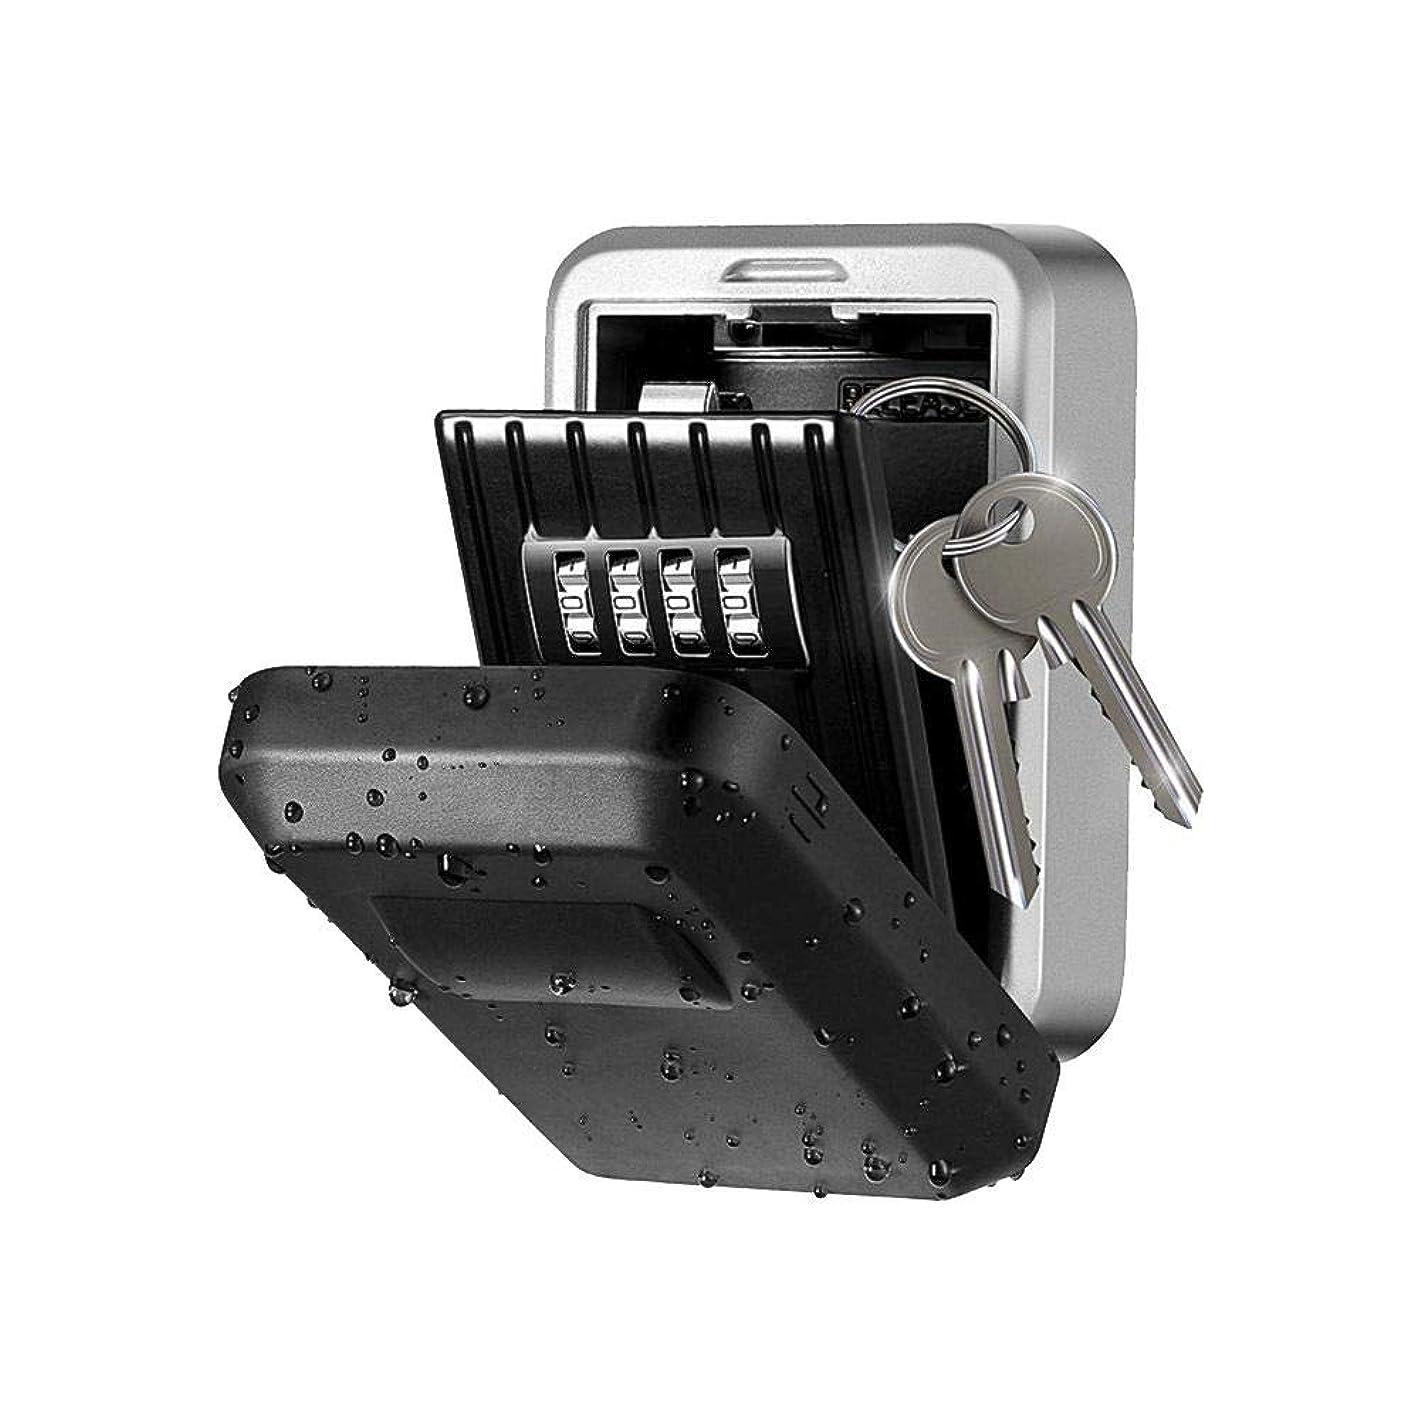 combnine Key Lock Box, Wall Mounted Key Safe Storage Password Key Box with 4-Digit Combination, Outdoor Anti-Theft Key Storage Box for Home Garage School Spare House Keys.